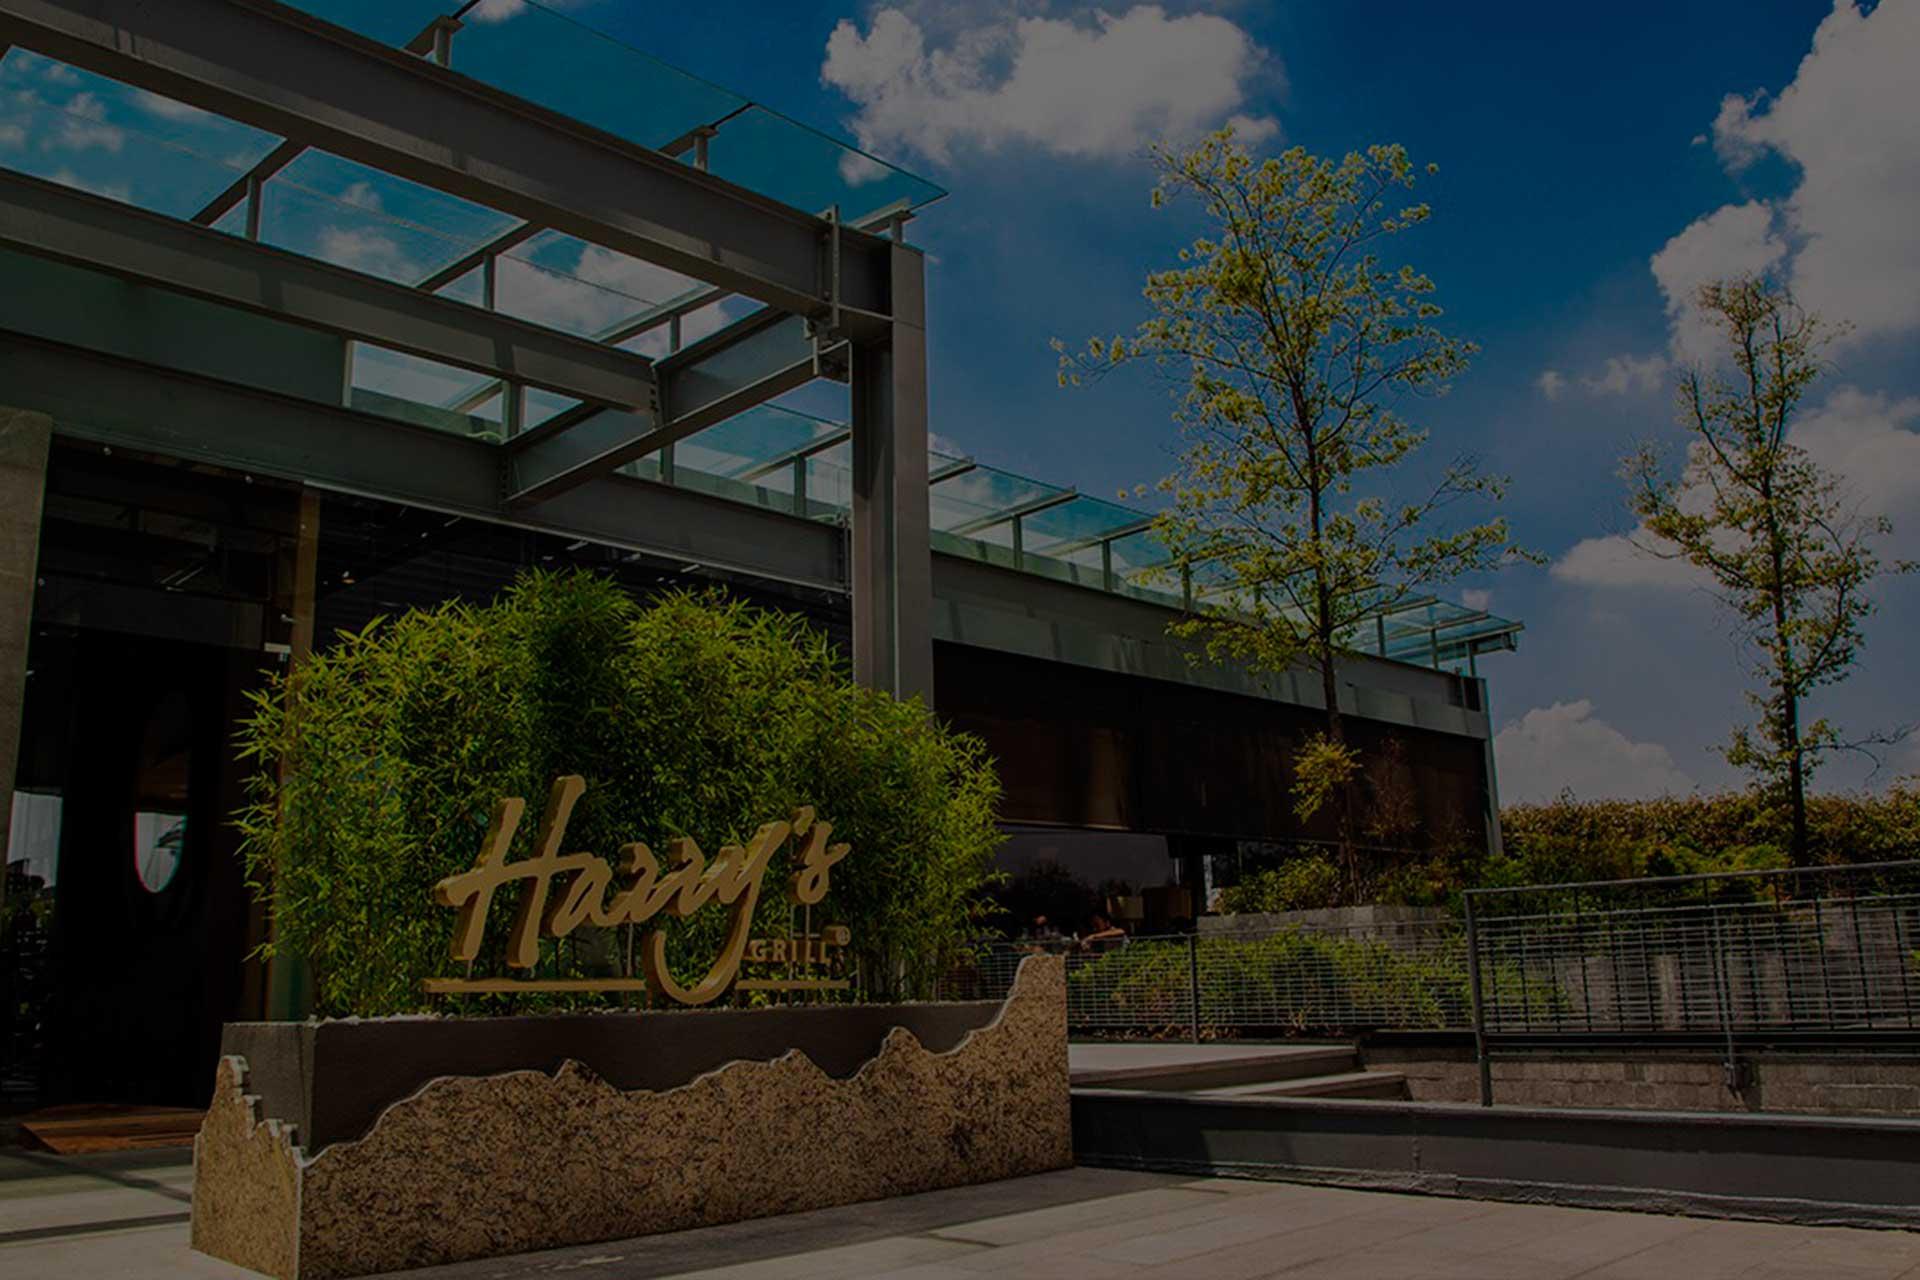 harrys prime steakhouse restaurante en santafe